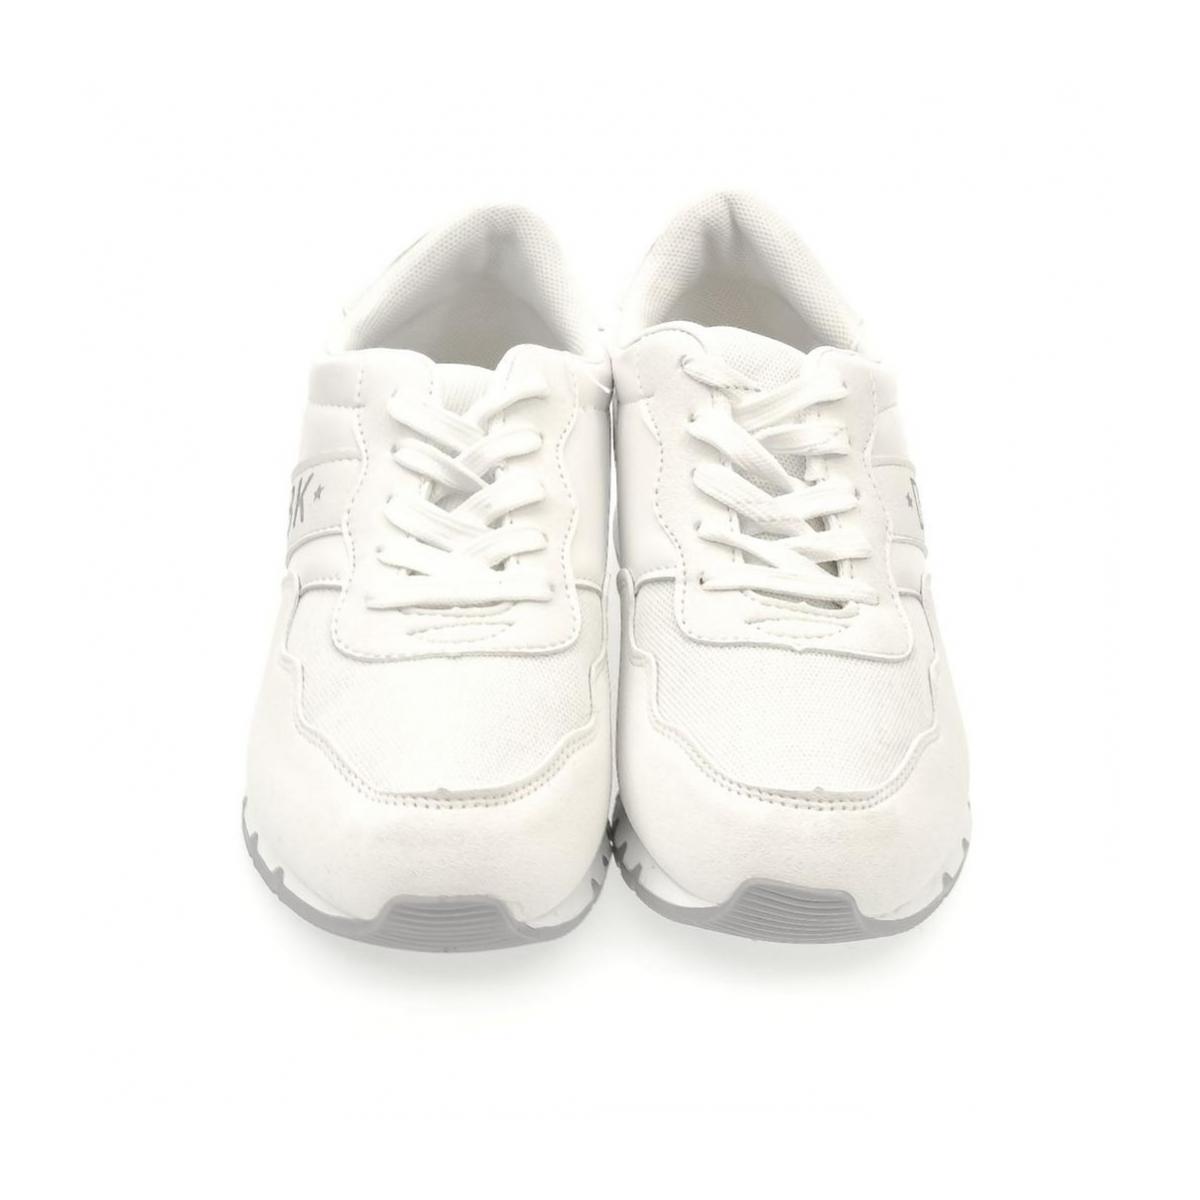 3e272b4694 Dámske biele tenisky MARI - 2